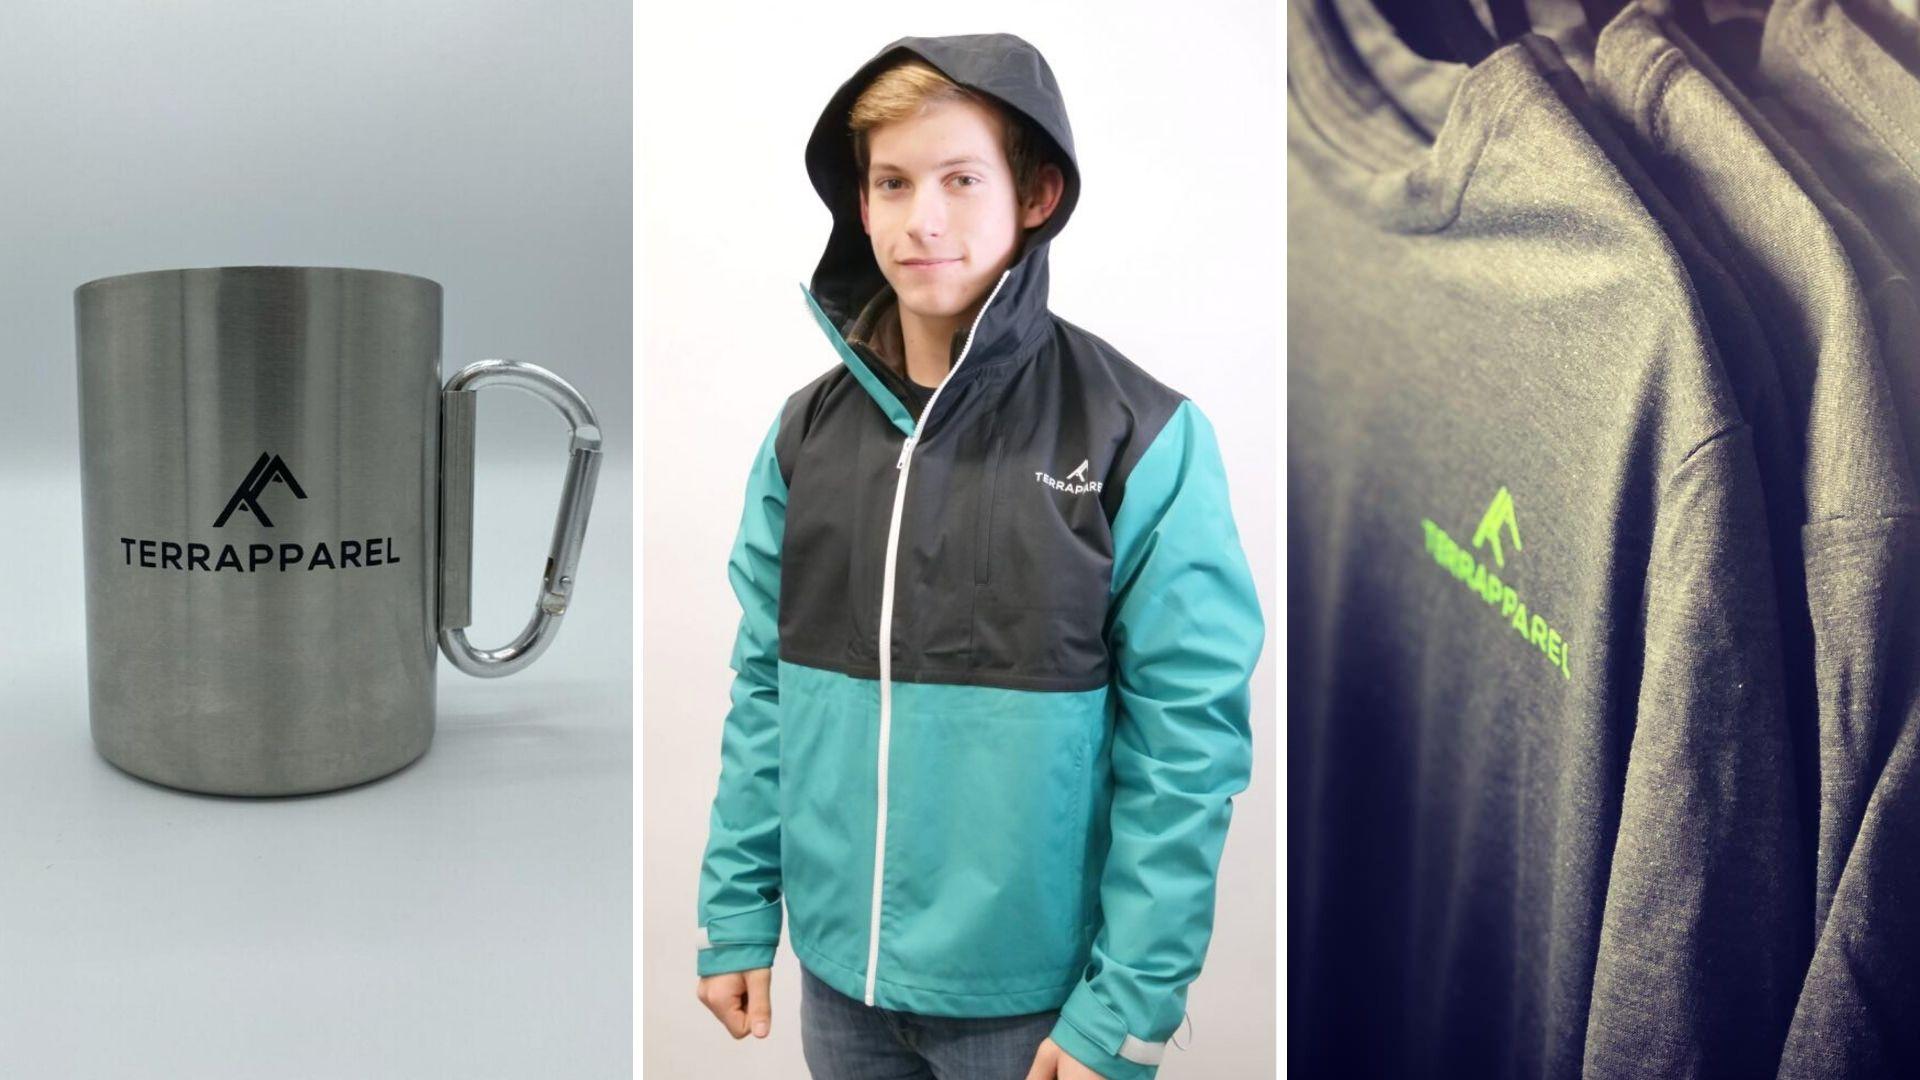 Image: TerrApparel mug, model wearing the Guardian rain jacket, and shirts